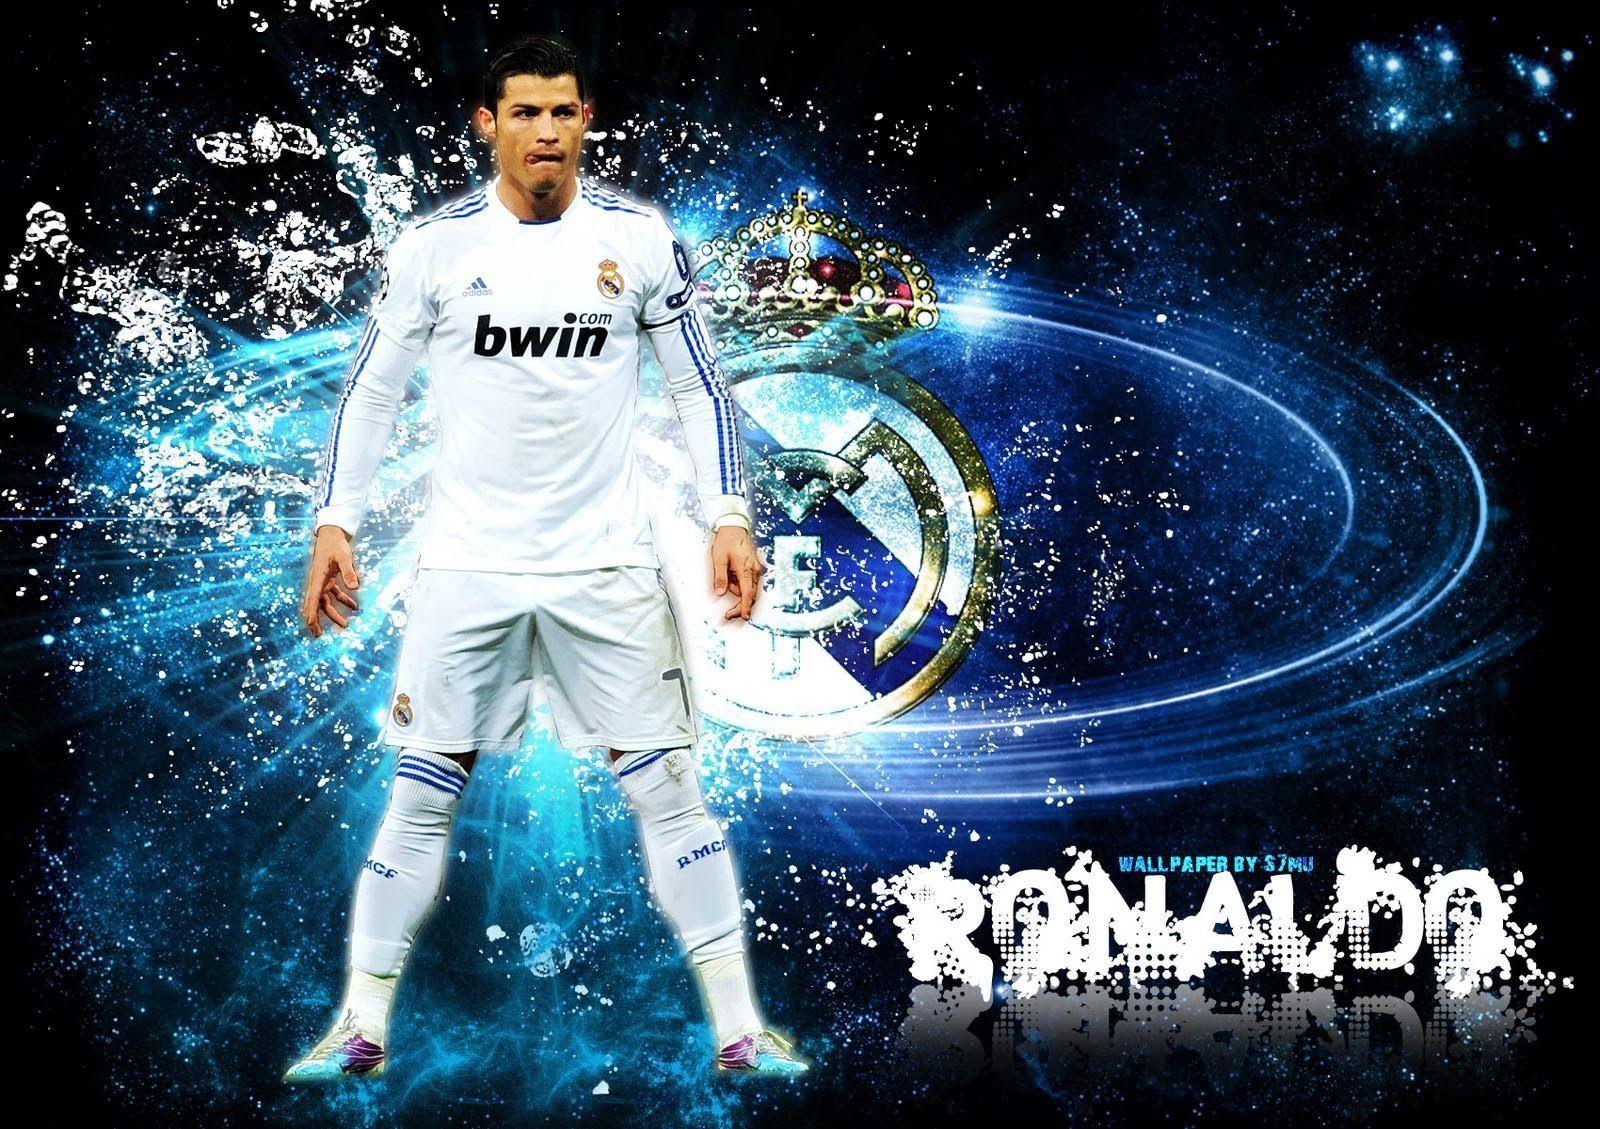 Cr7 Wallpaper Images Ronaldo Wallpapers Cristiano Ronaldo Wallpapers Cristiano Ronaldo